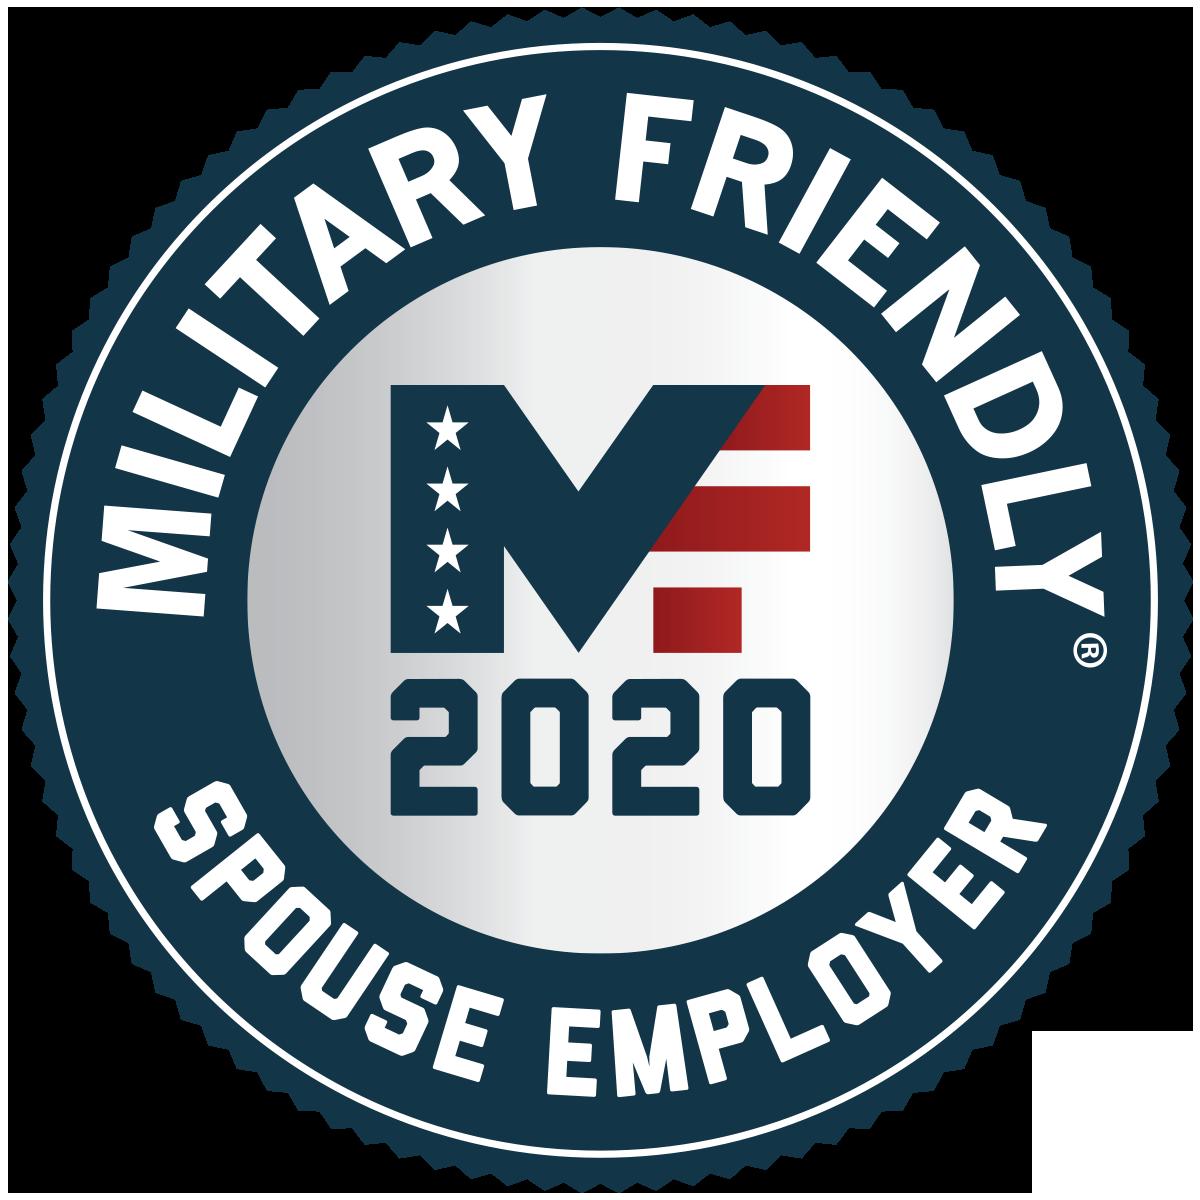 Military Friendly Spouse Employer - 2020